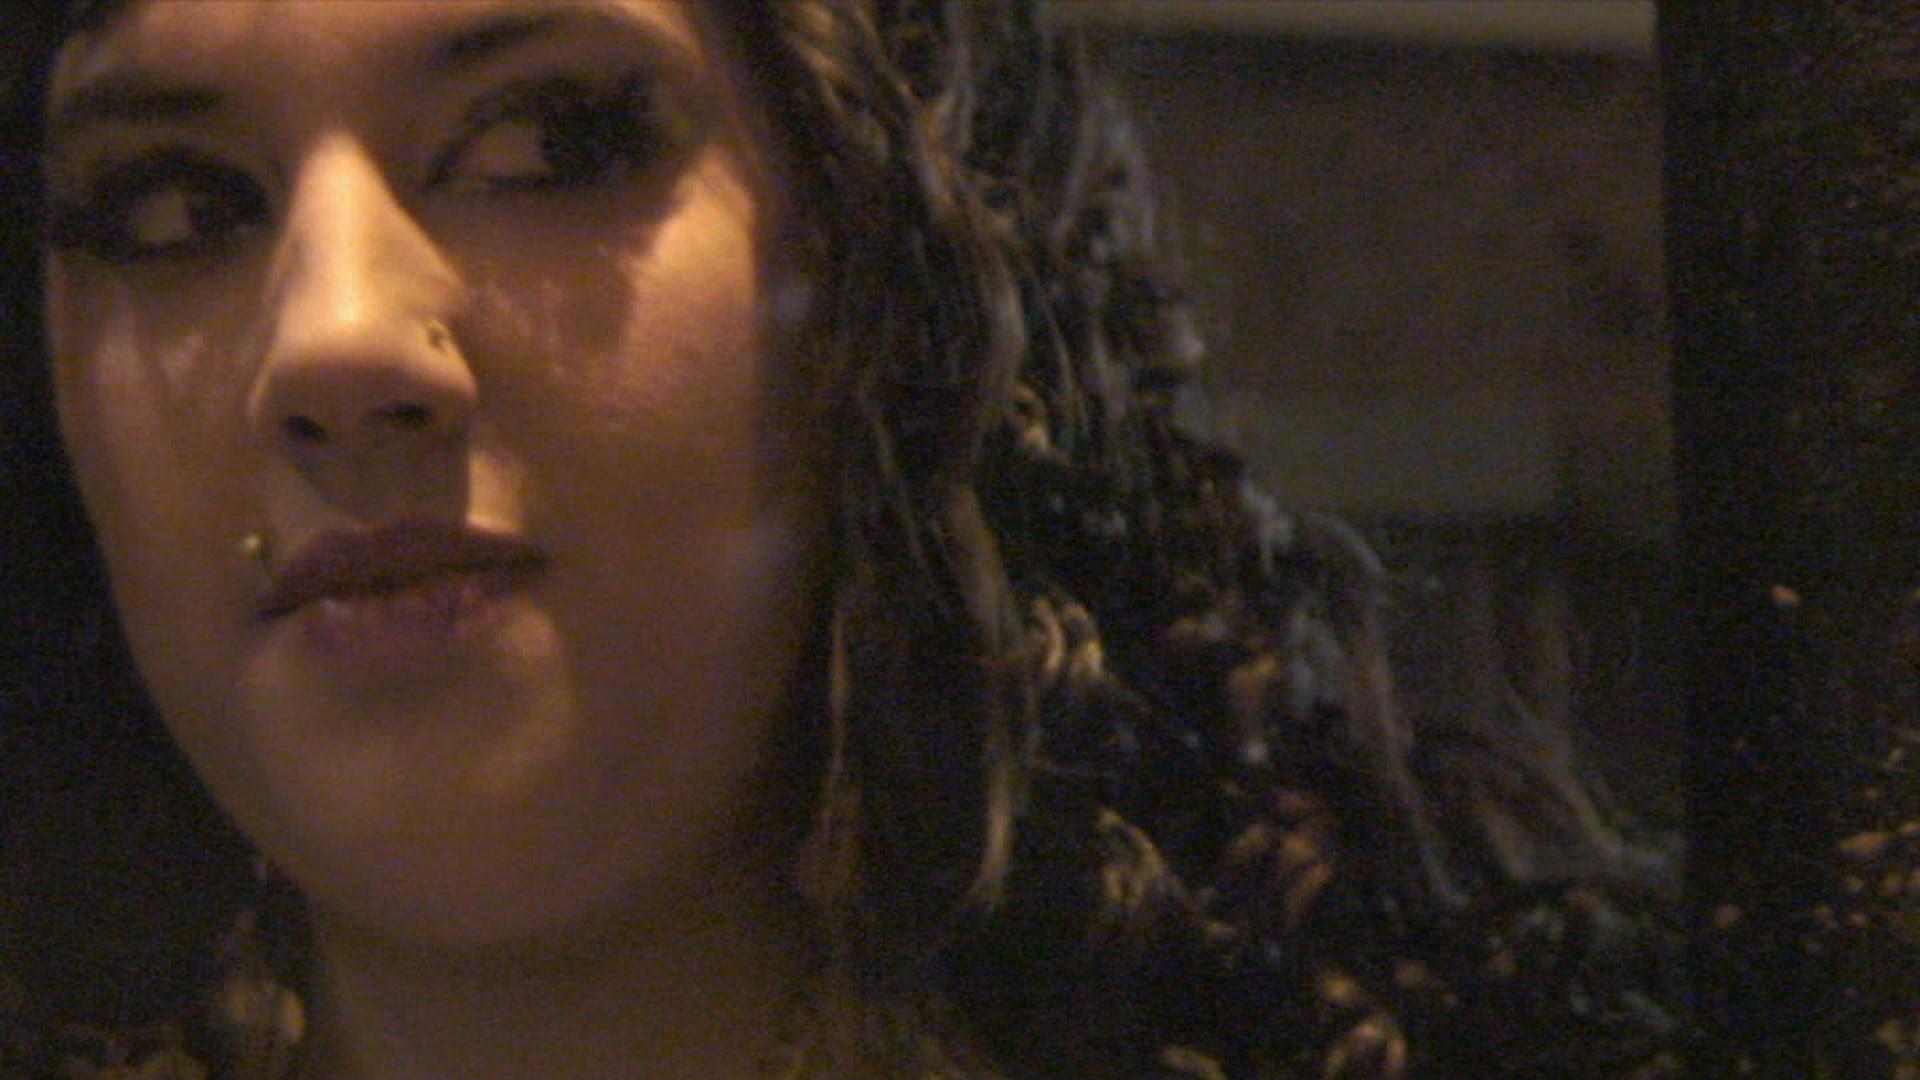 Rohan Quine, 'The Imagination Thief' - film 'EVELYN 62-39-32-84-100', still 4